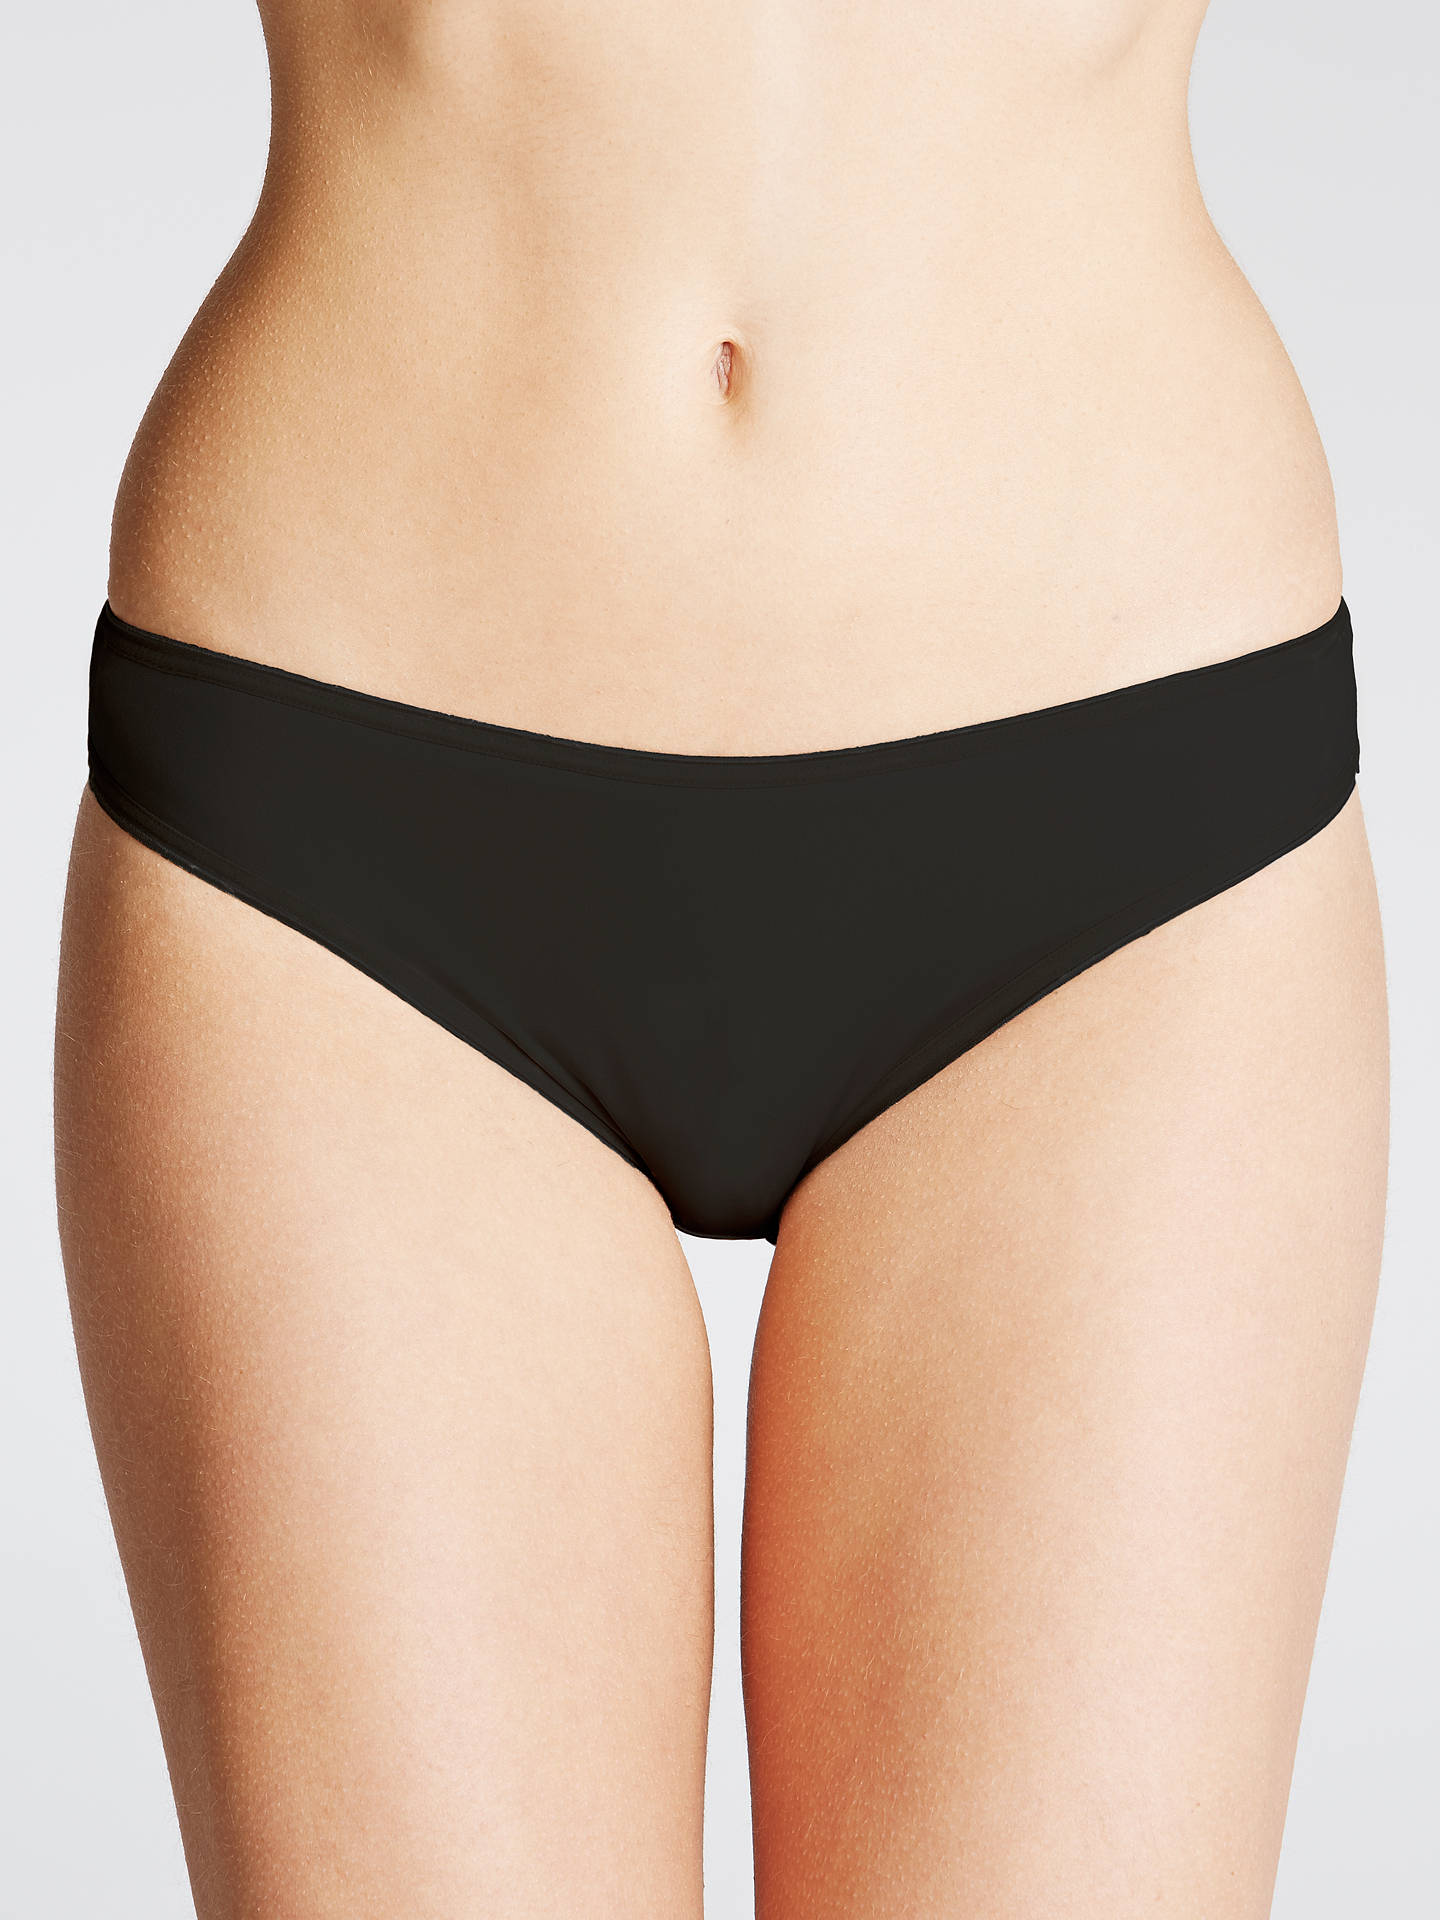 5248a2764068 Buy John Lewis & Partners 3 Pack Microfibre Bikini-Cut Briefs, Black, 8 ...